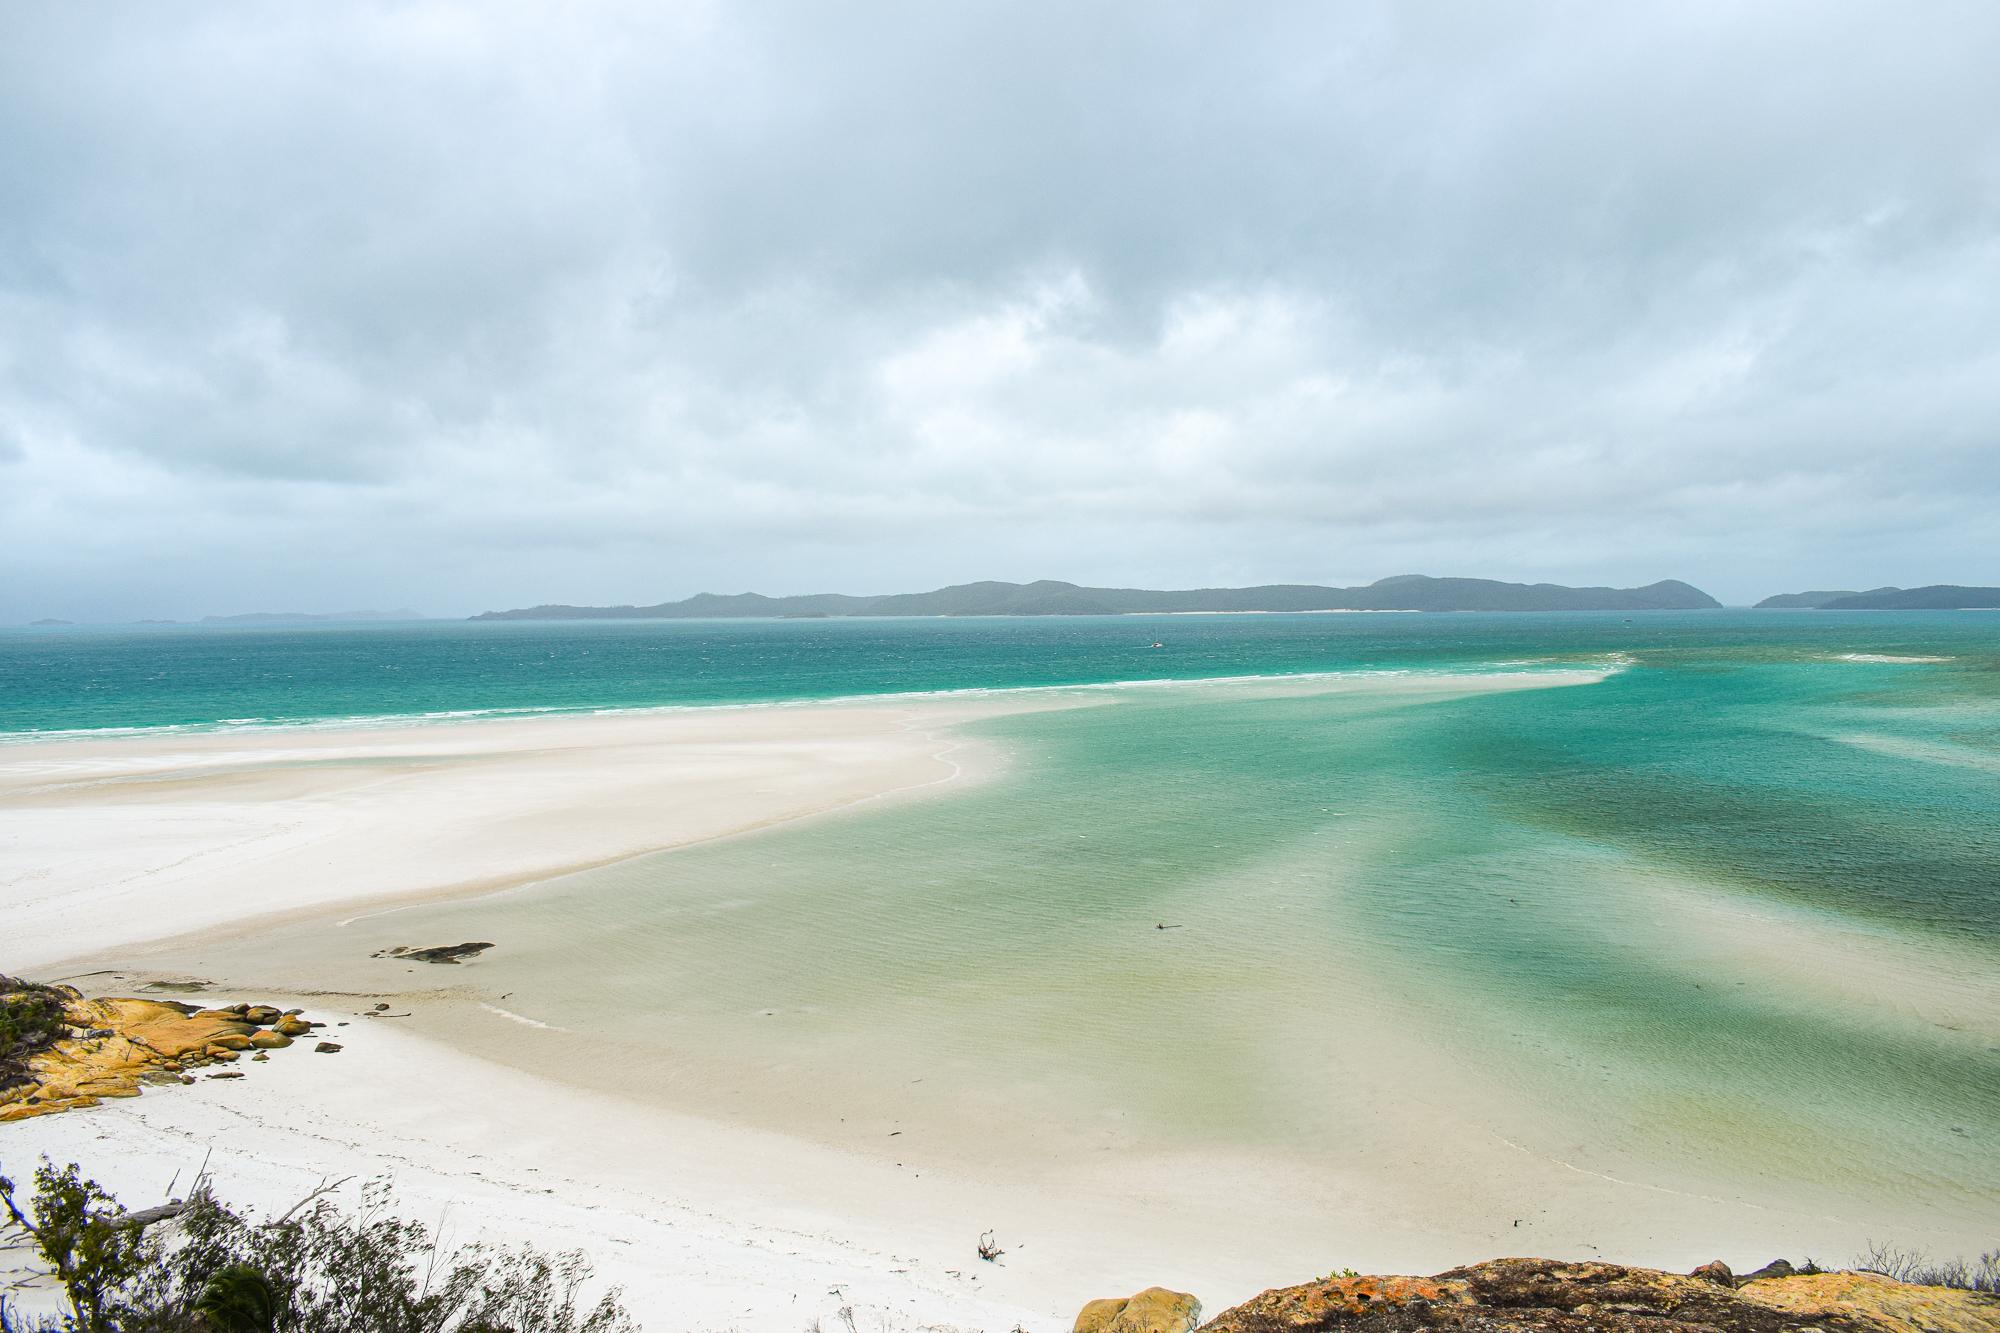 North whitehaven beach på whitsunday islands.